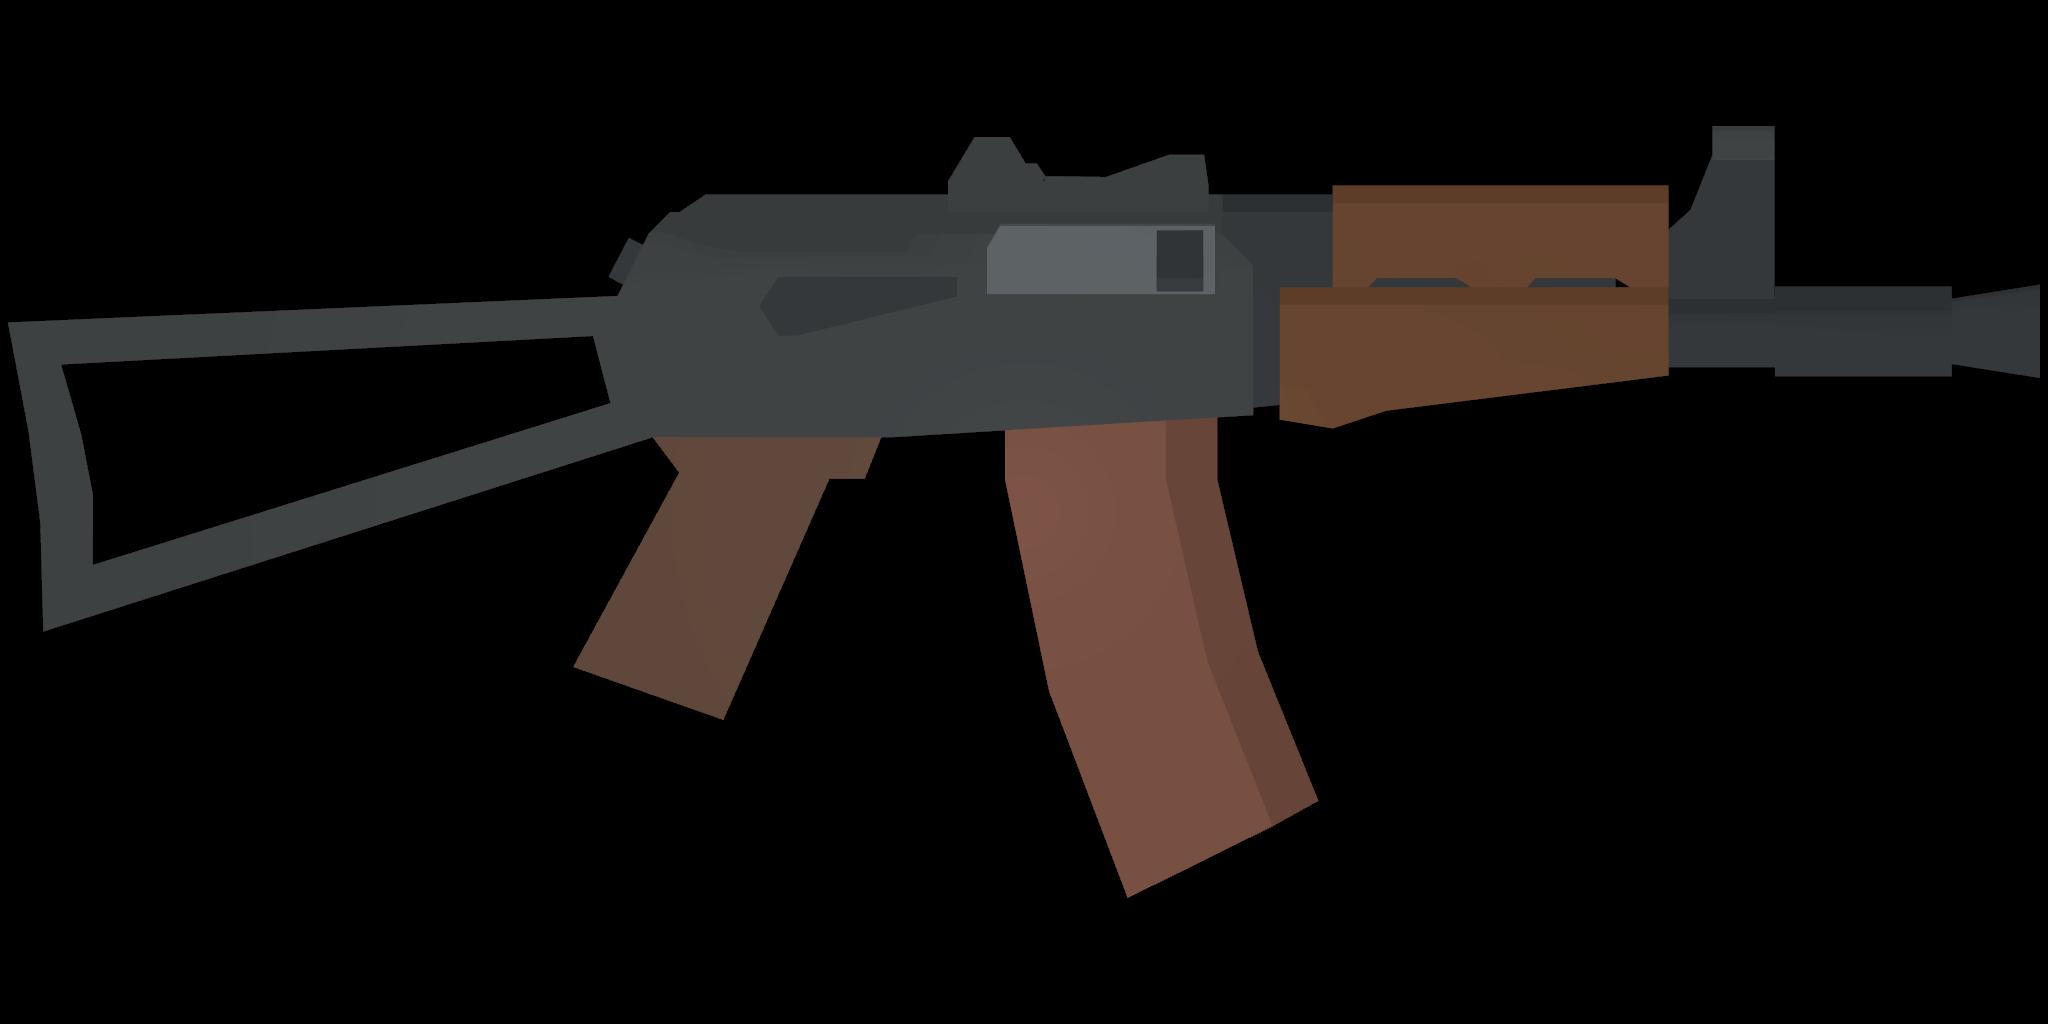 Unturned Uncreated Warfare Mods & All ID List + Attachments - Russian Weapons - DE5D7D9